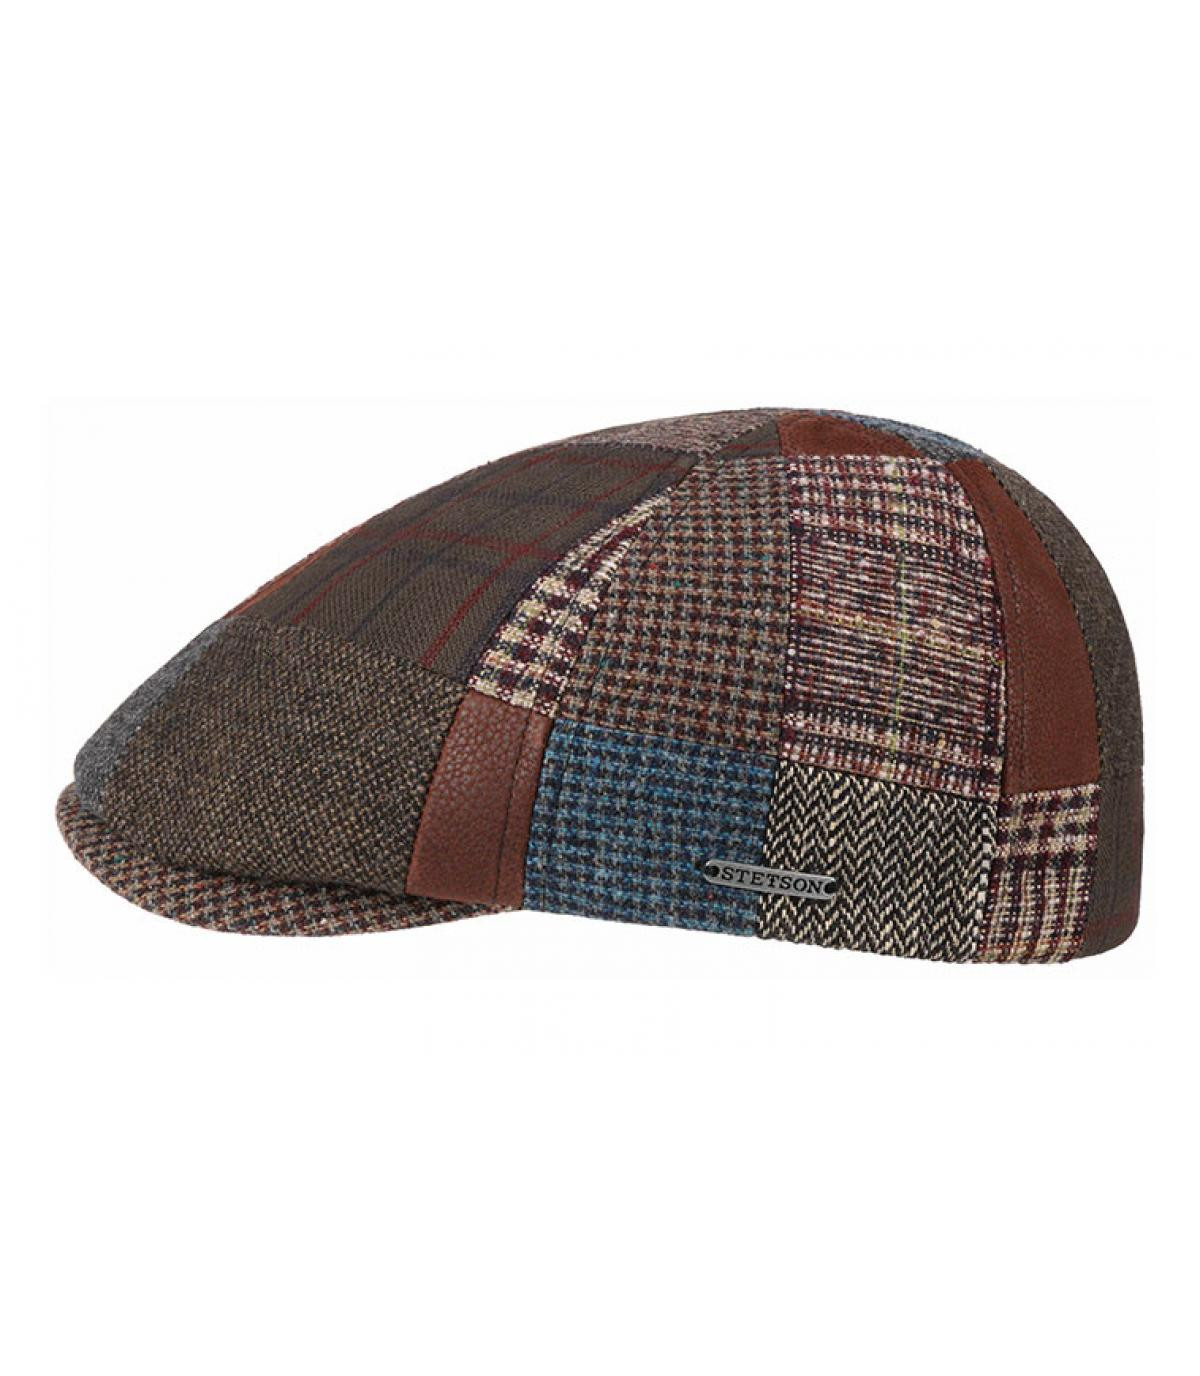 gorra patchwork lana cuero